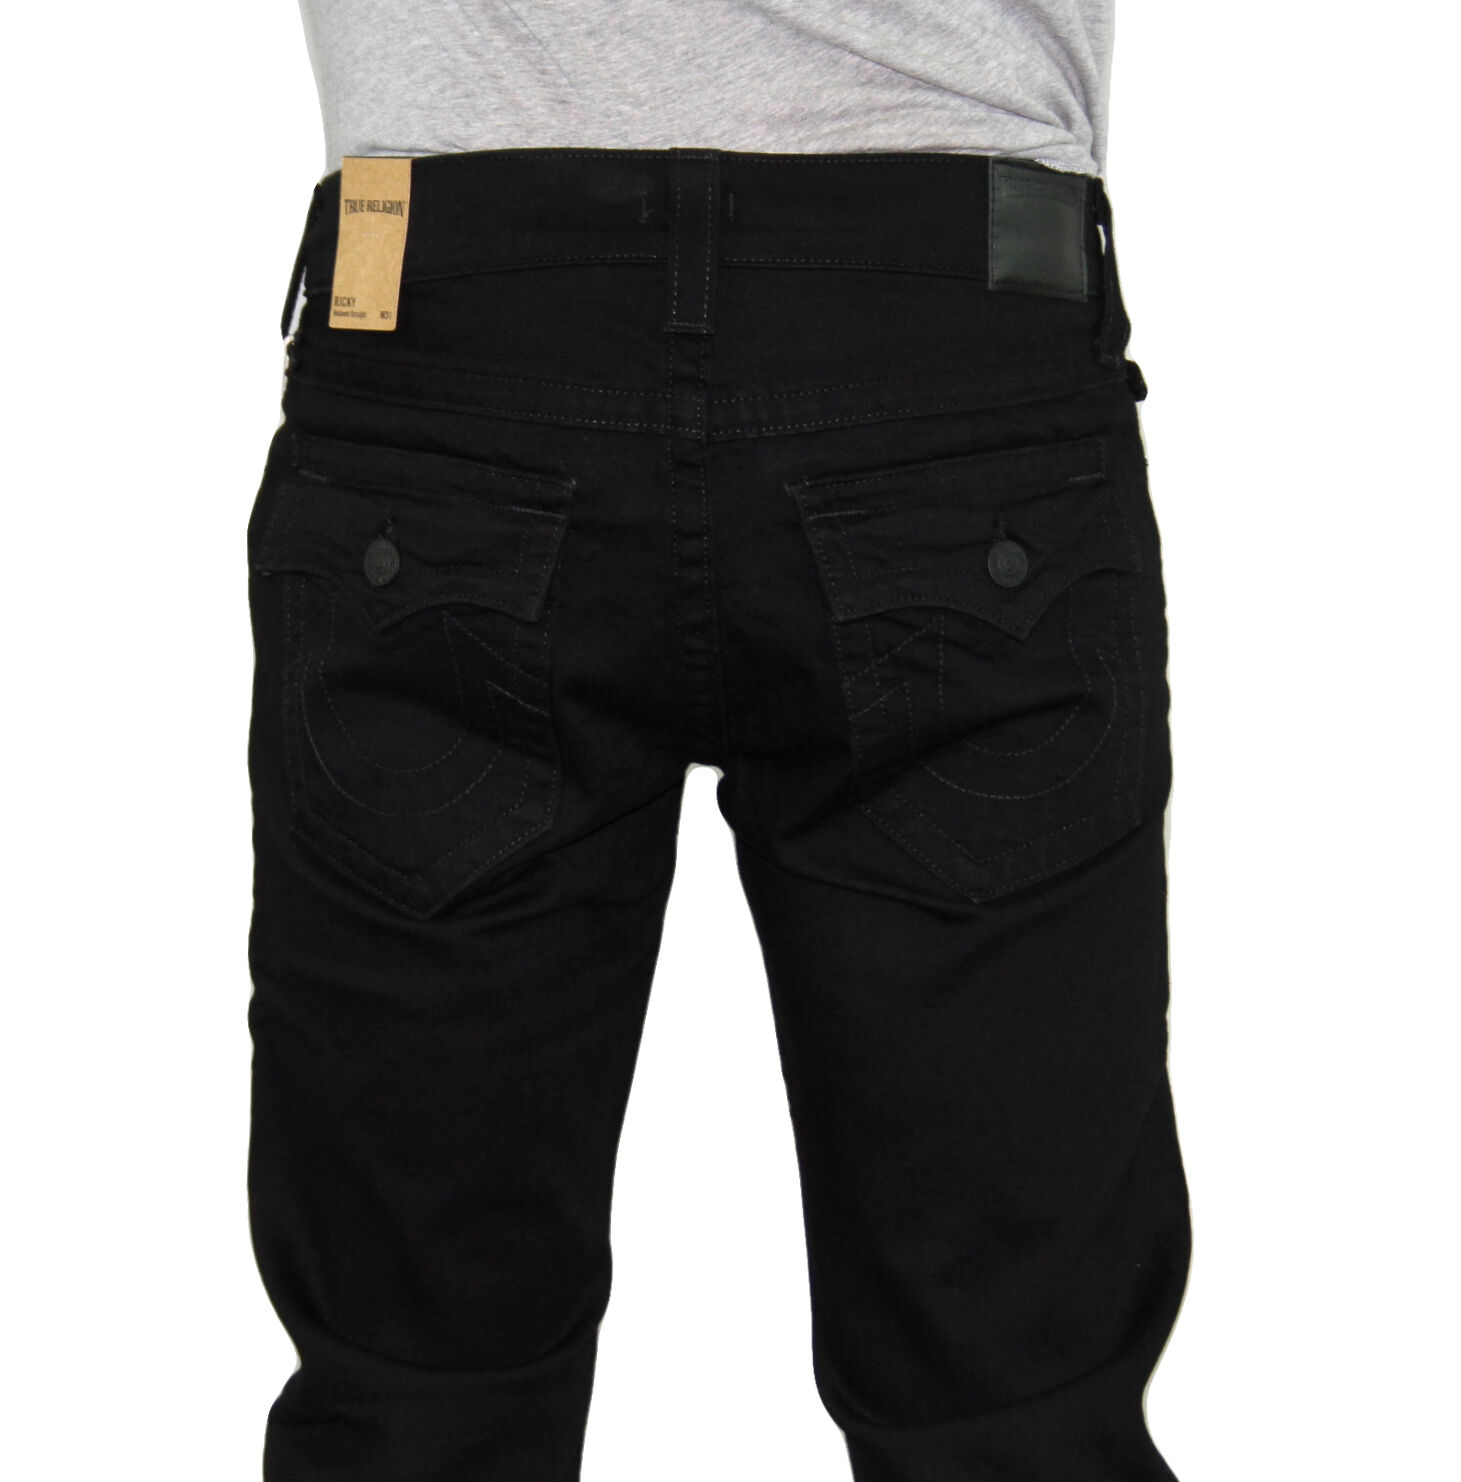 NWT True Religion Brand Men's Ricky Straight Leg Midnight black Jeans Pants